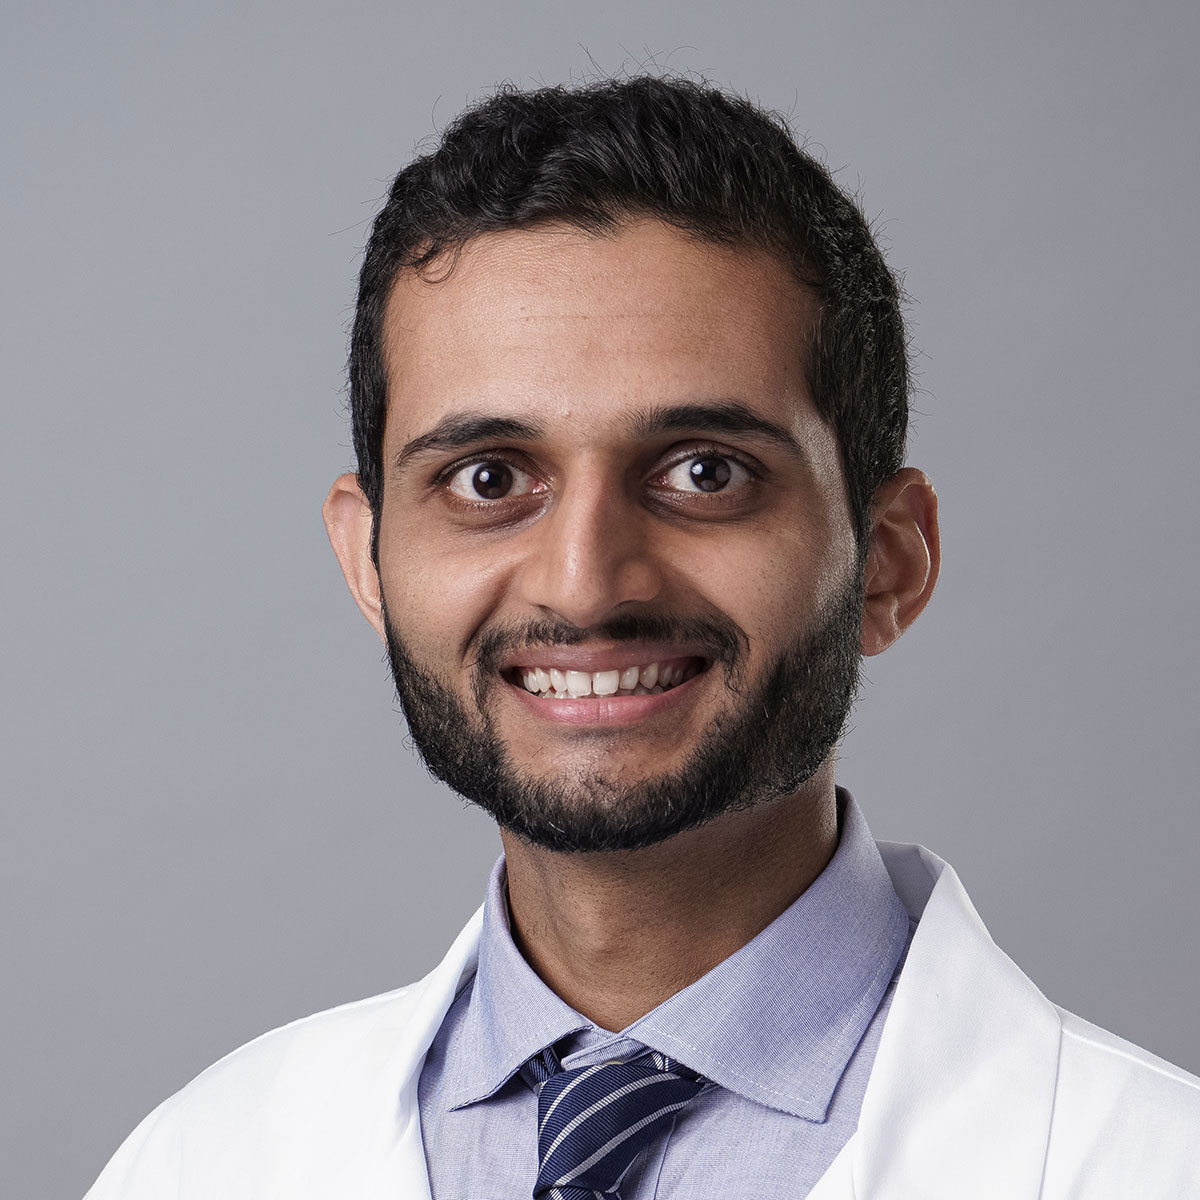 A friendly headshot of Dr. Parth Patel